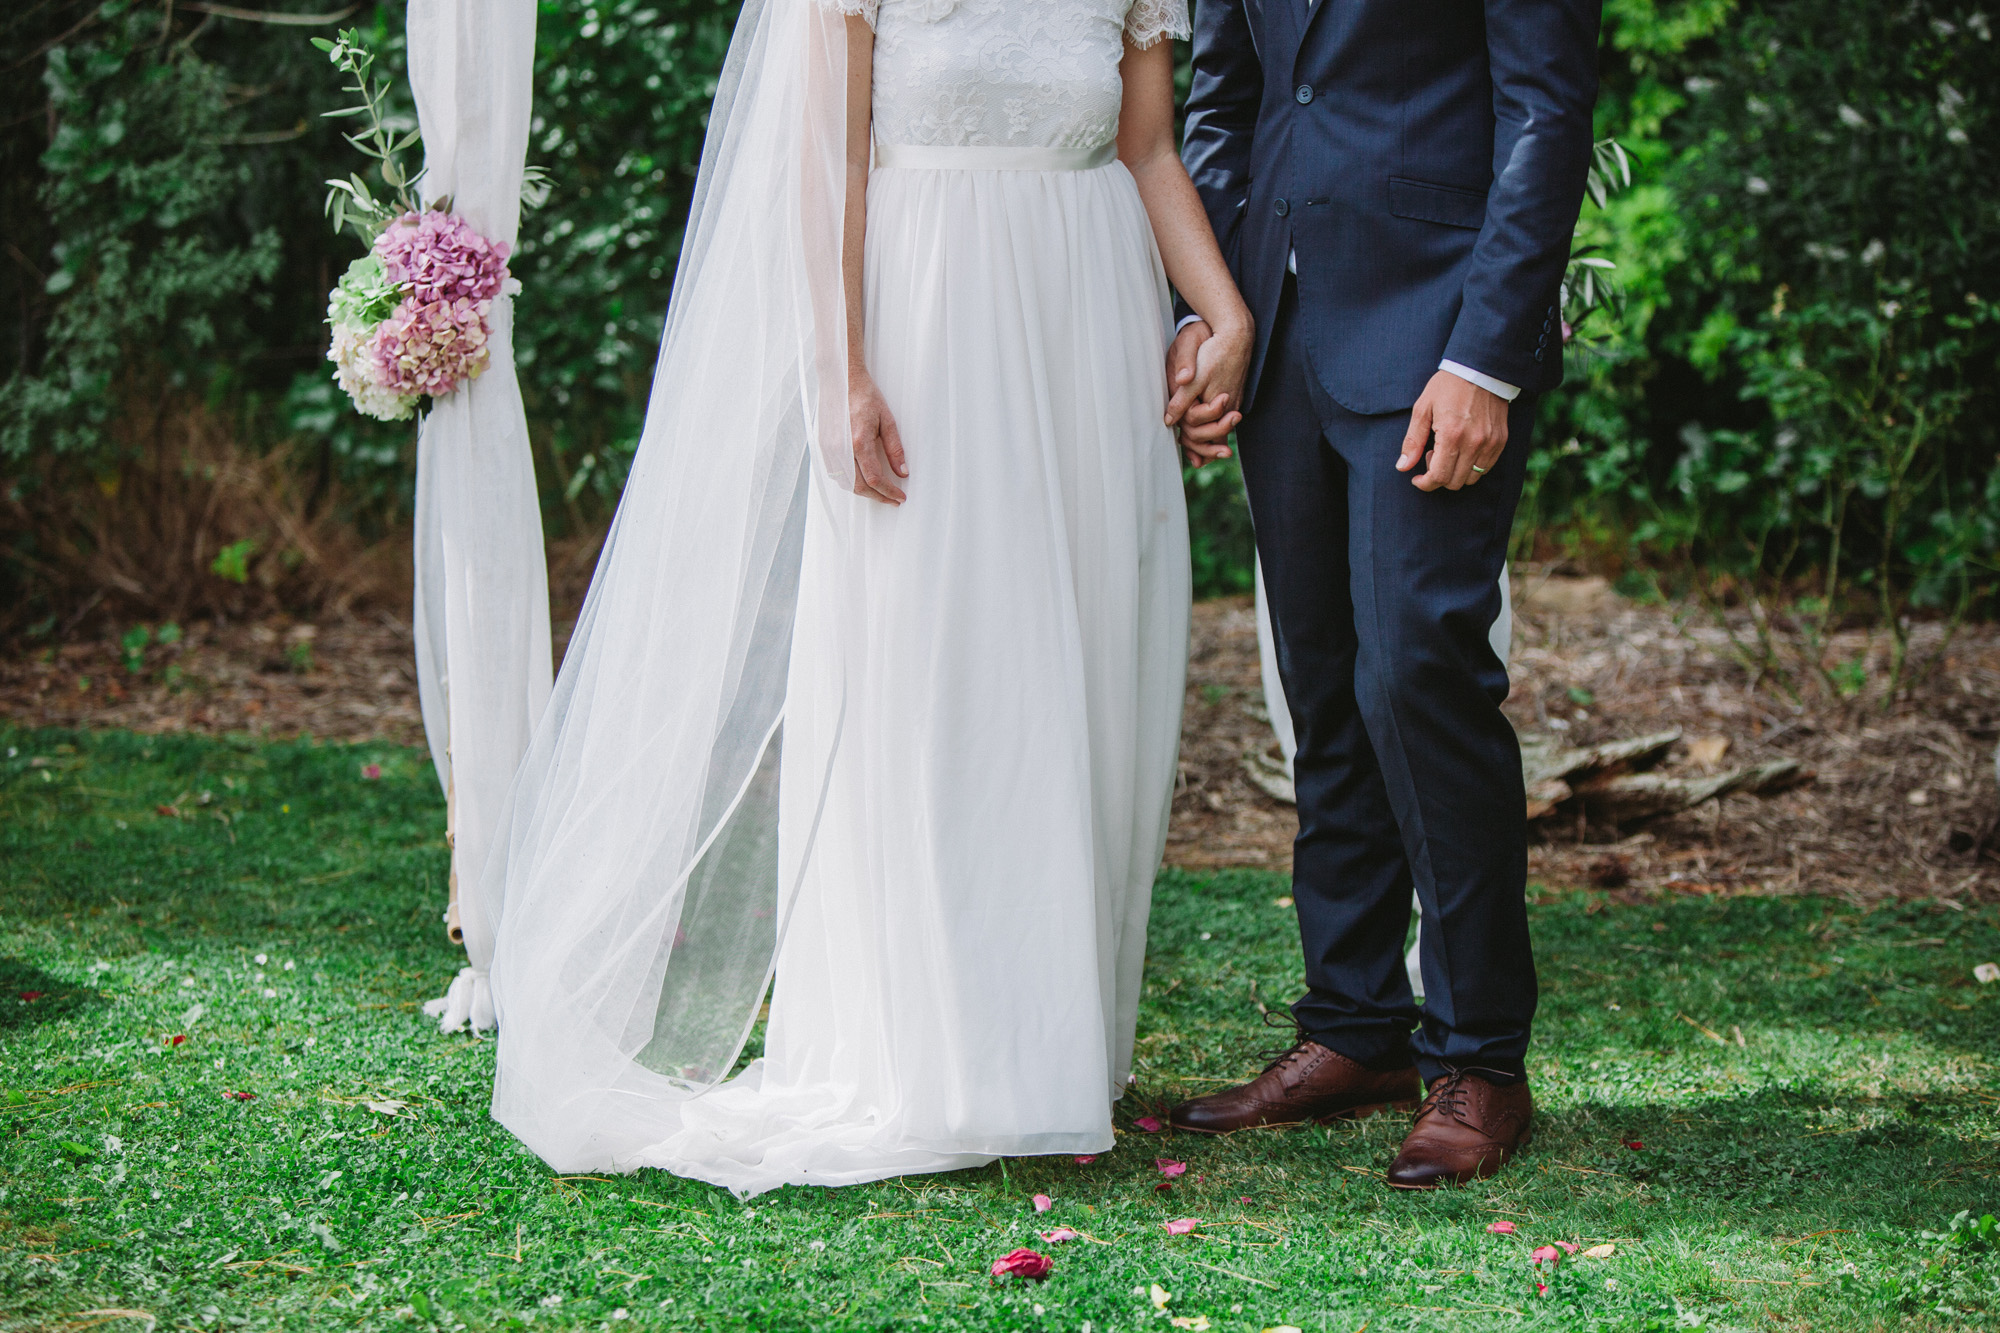 SMP_tarureka_wedding_030.jpg